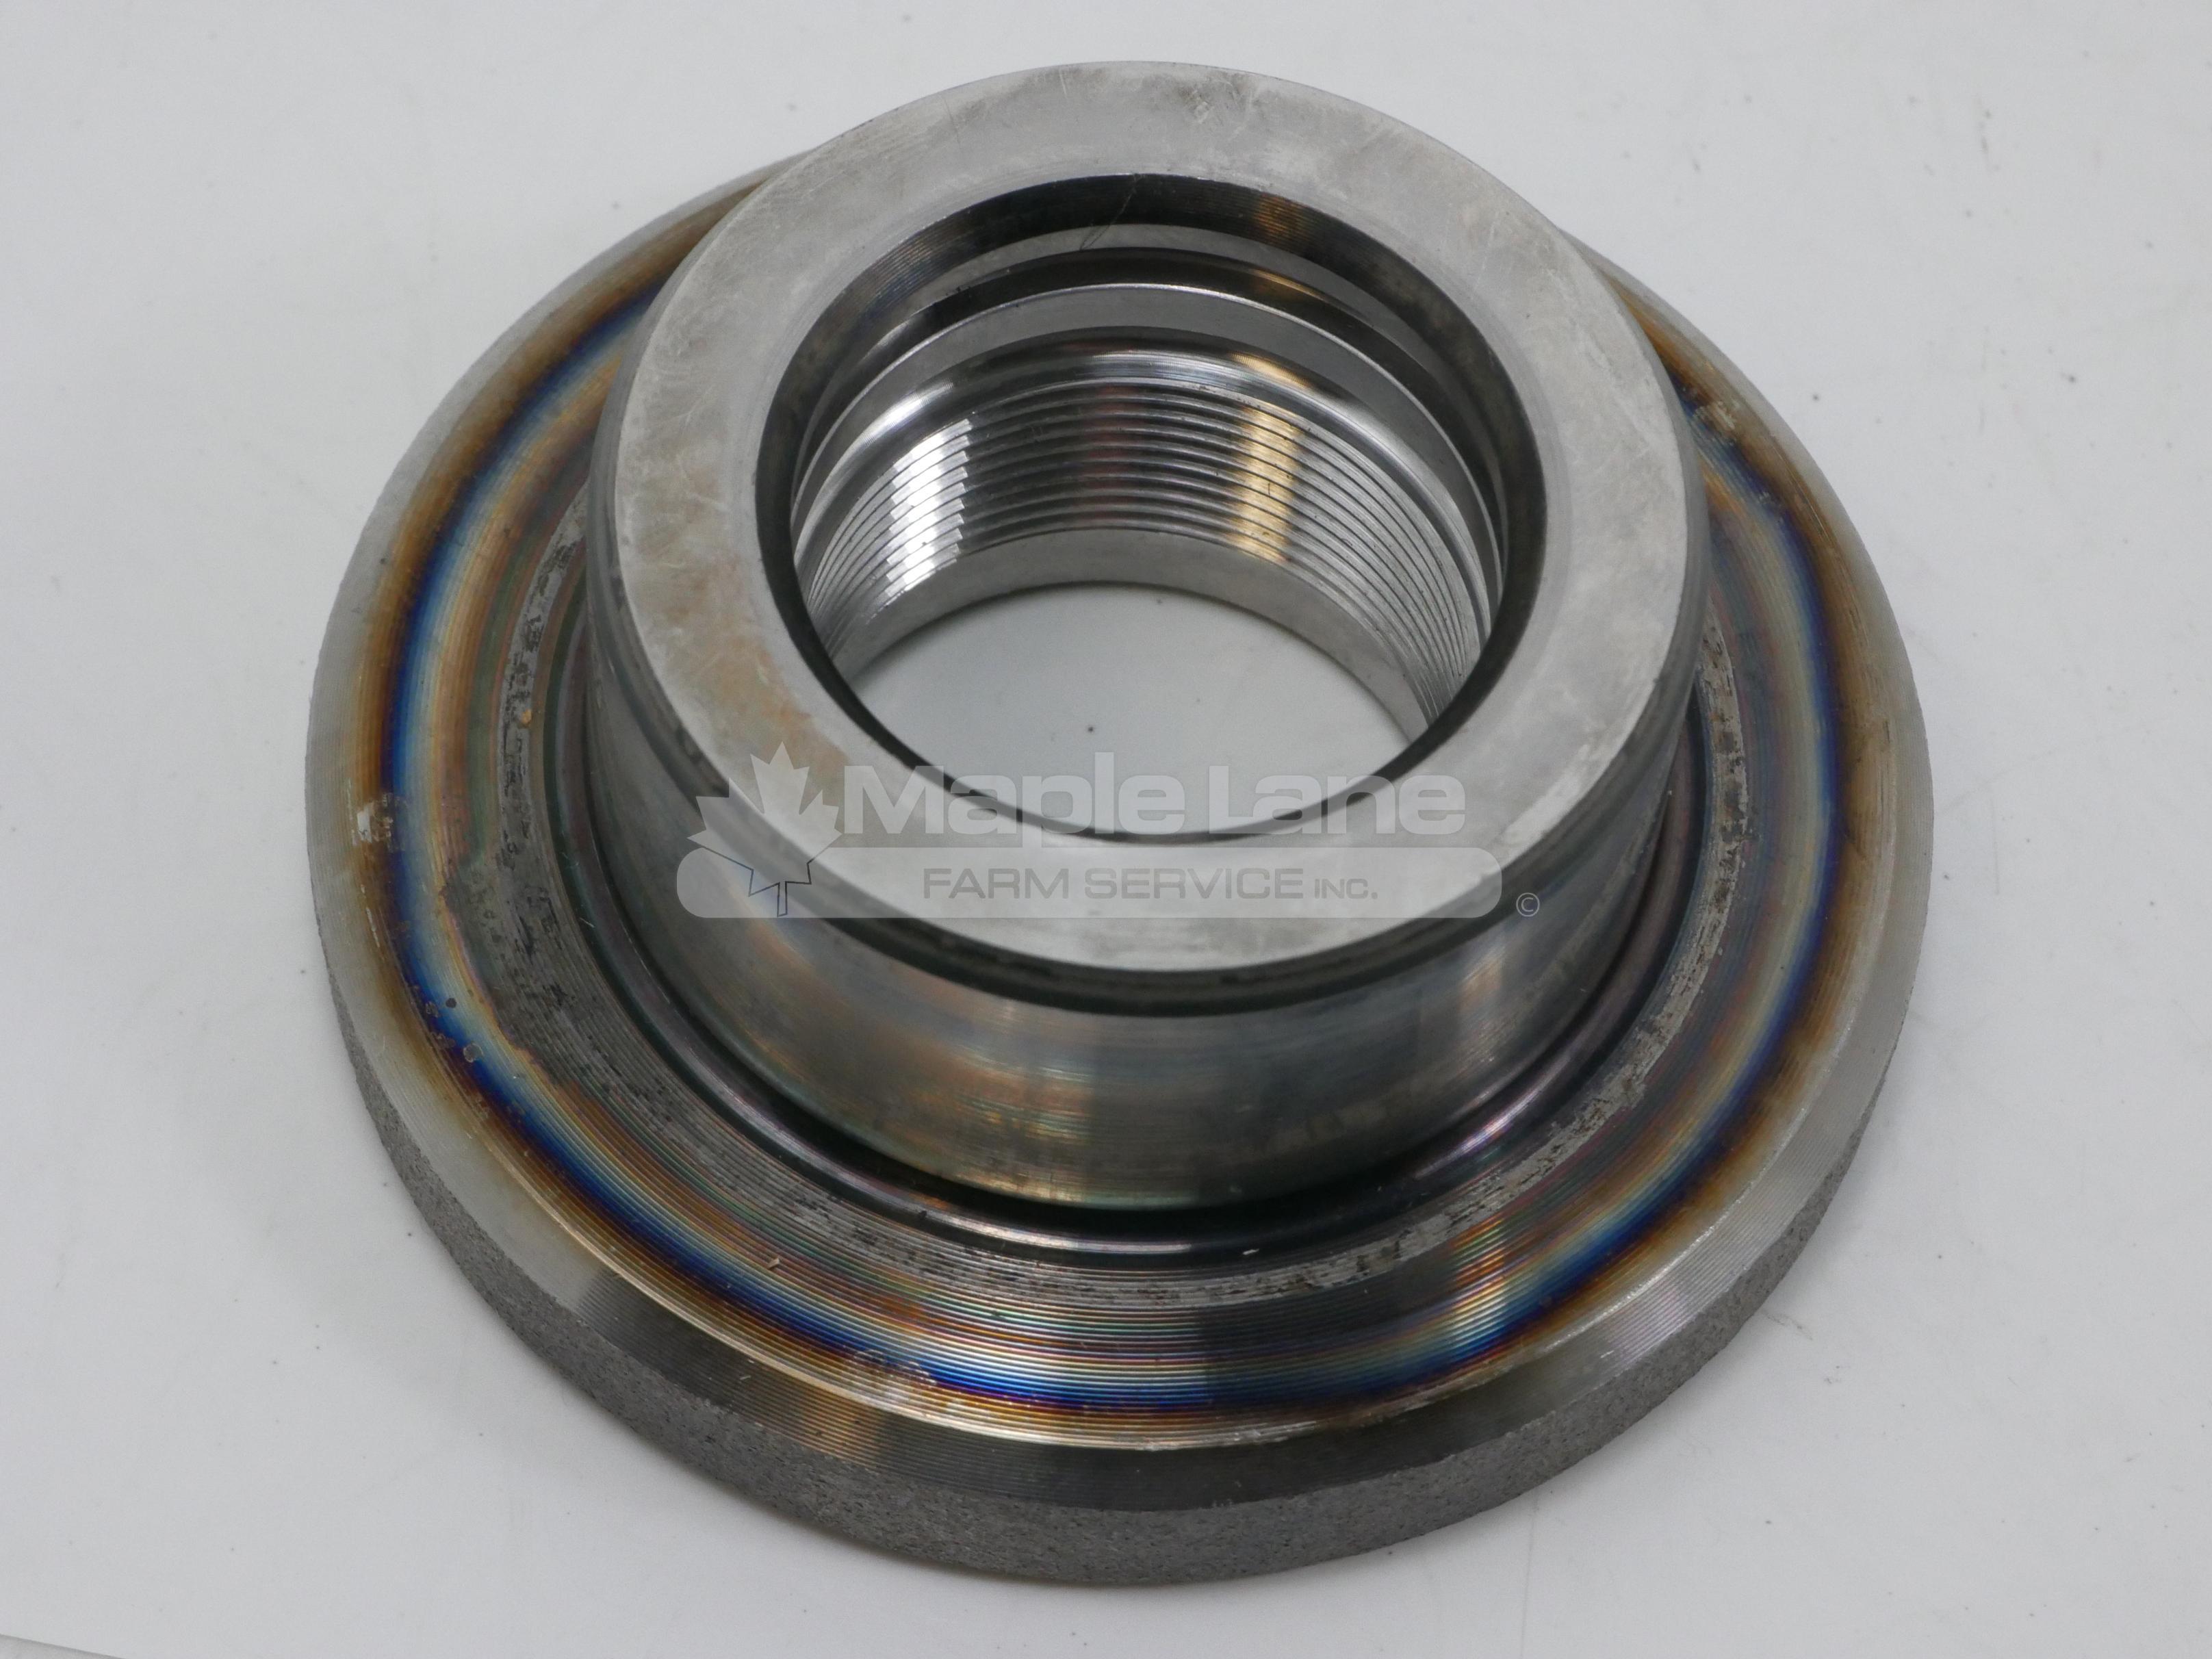 3764502m1 nut